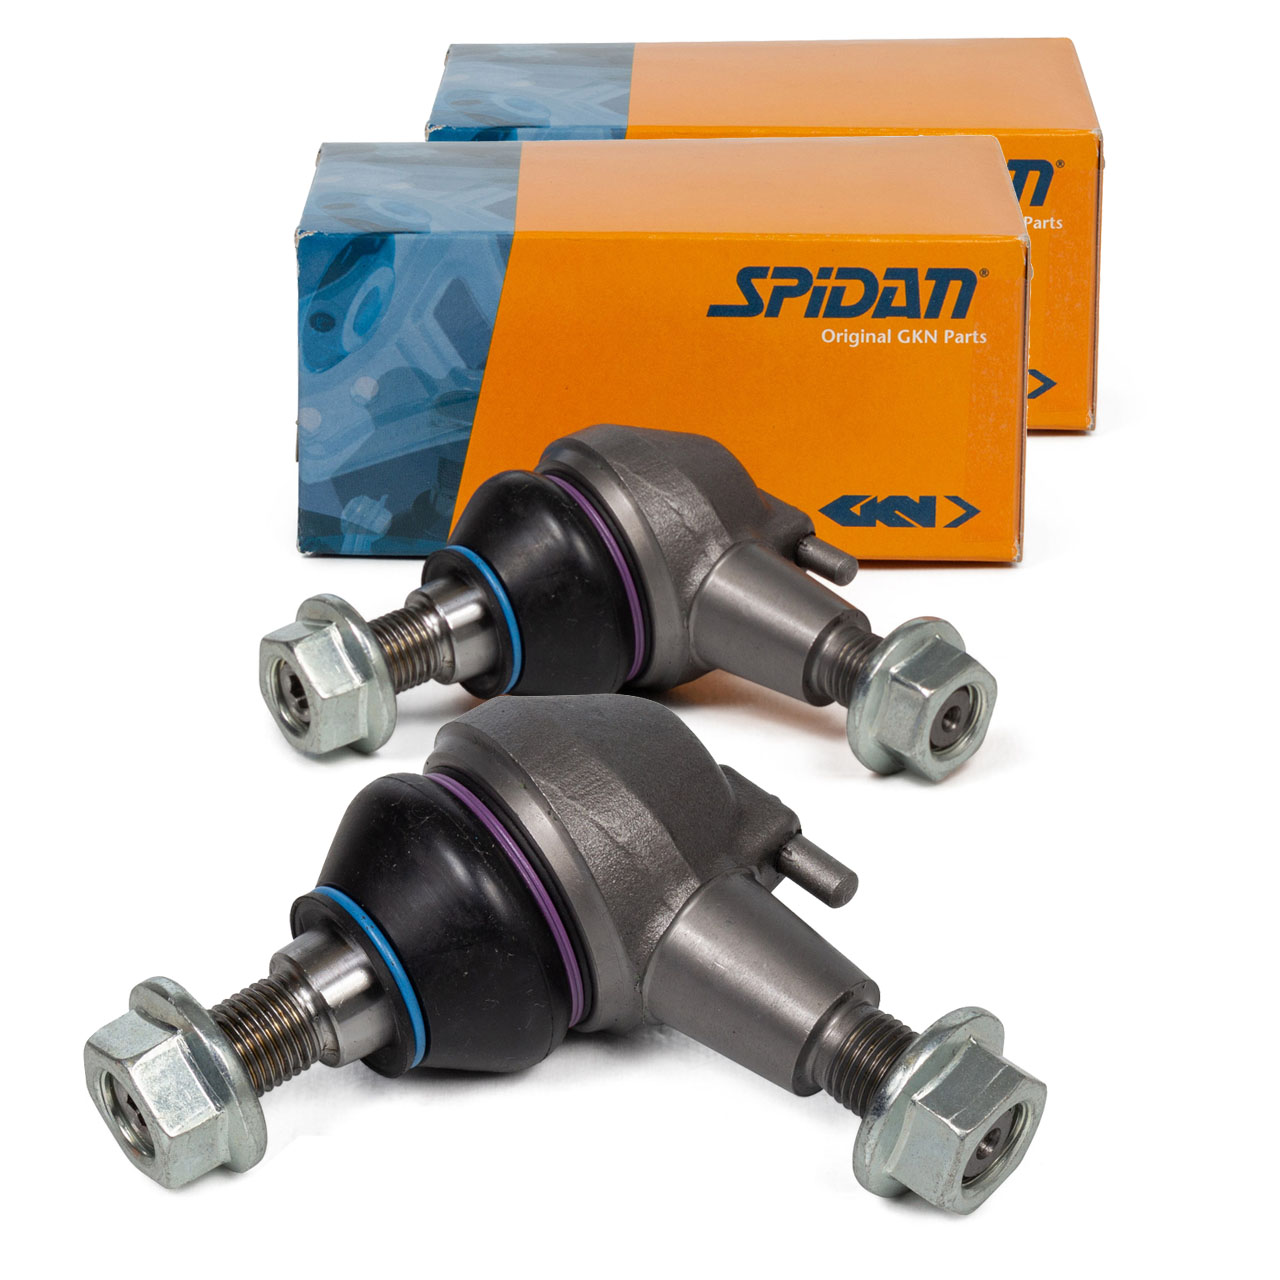 2x SPIDAN Traggelenk MERCEDES CLS C218 X218 E-KLASSE W212 S212 vorne unten 2123300135